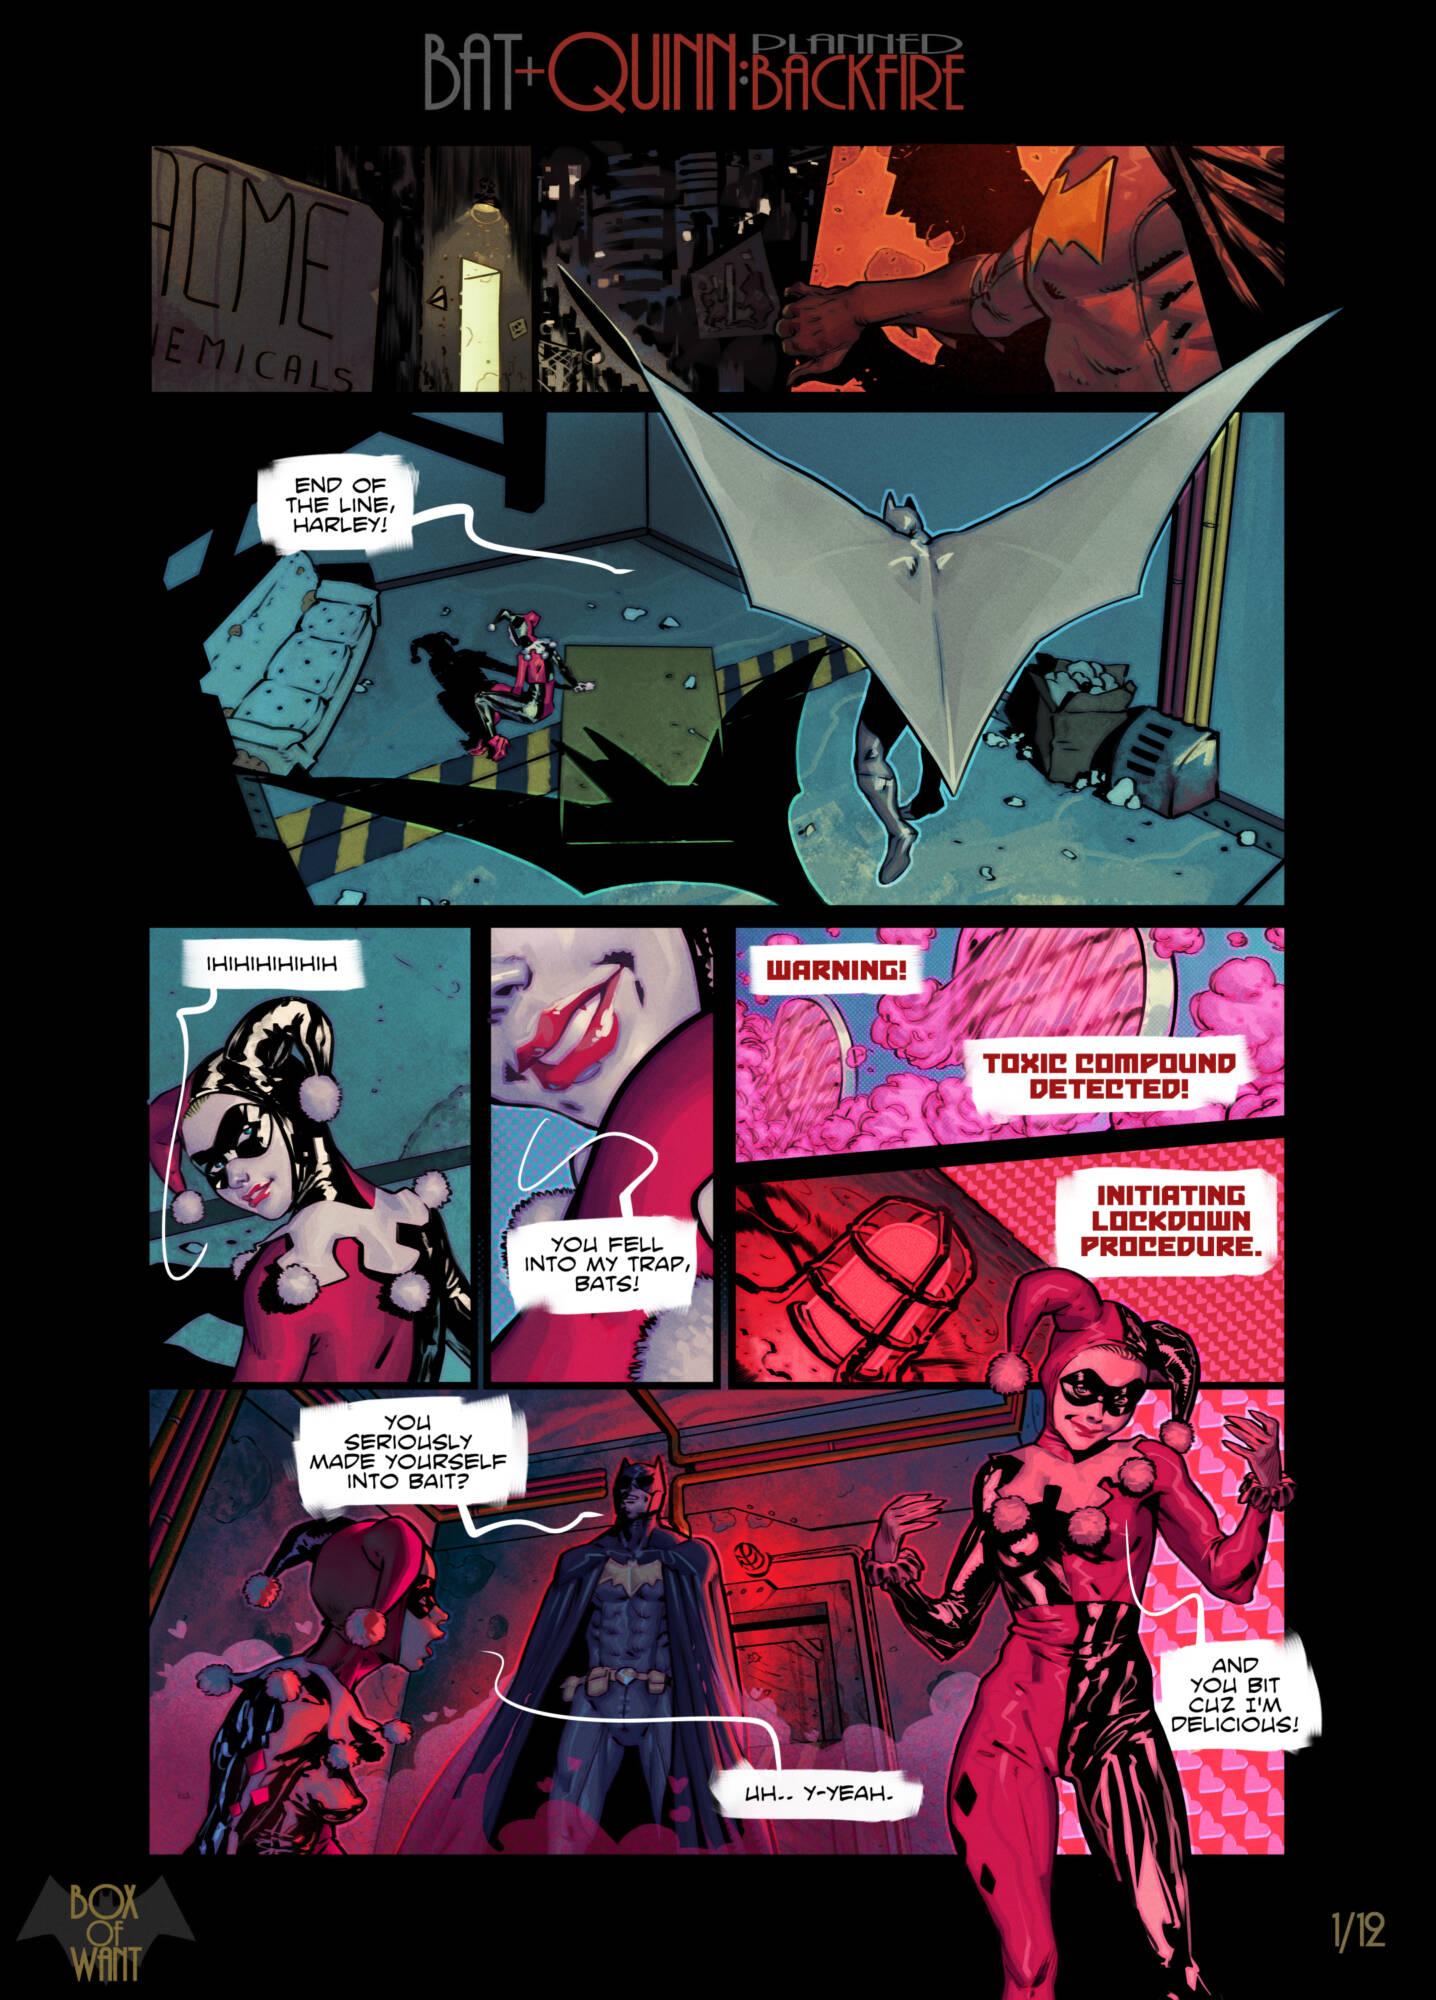 Planned Backfire (English) - page01 Batman,DC Comics,  xxx porn rule34